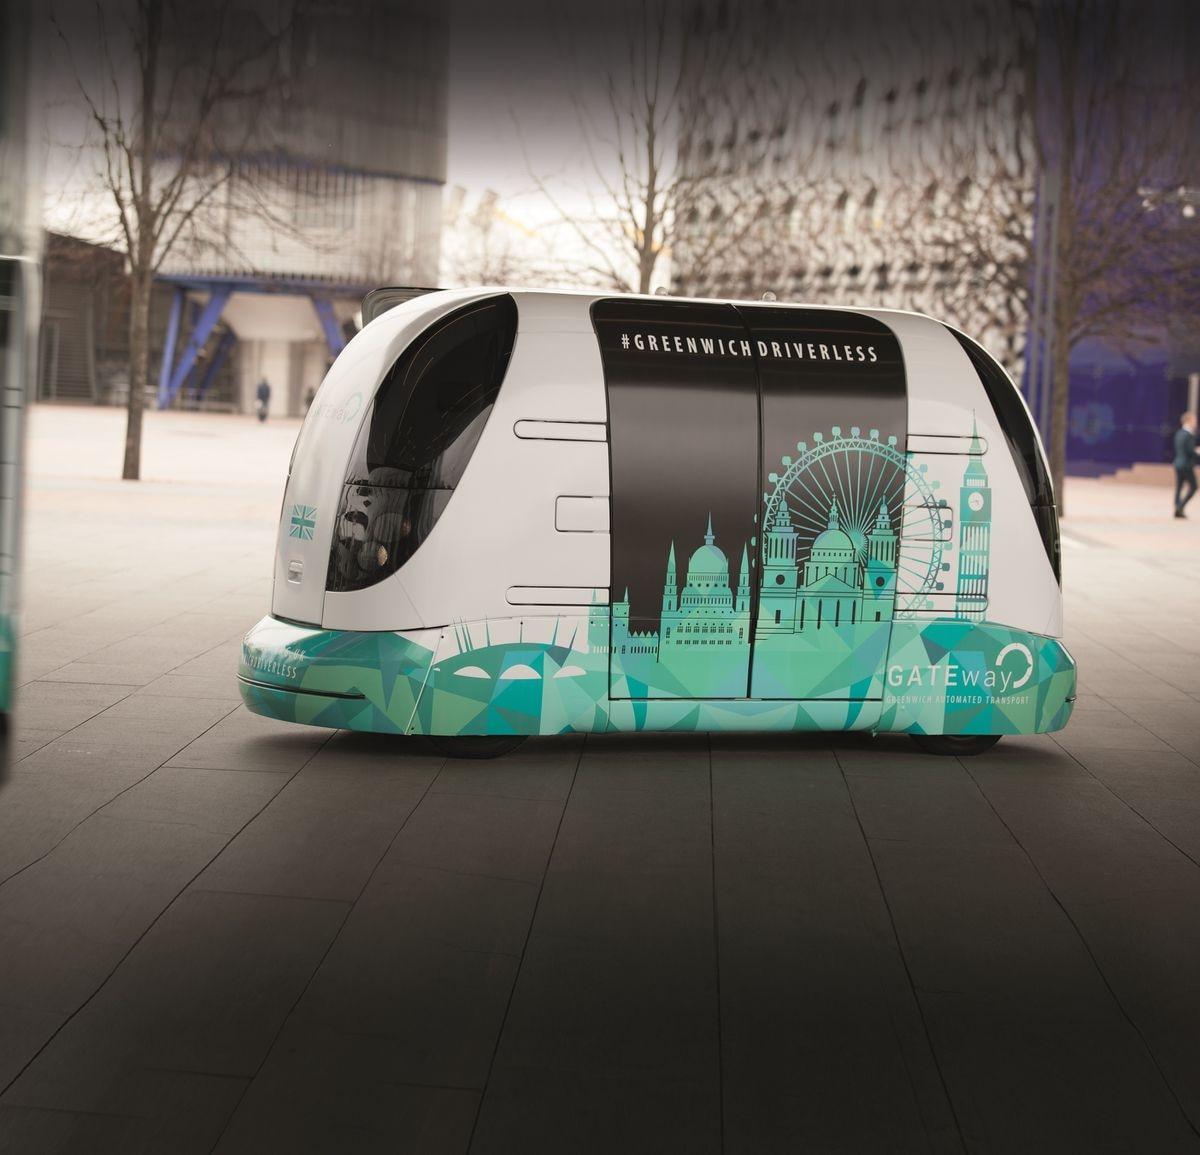 One of Westfield's self-driving GATEway shuttle vehicles in Greenwich